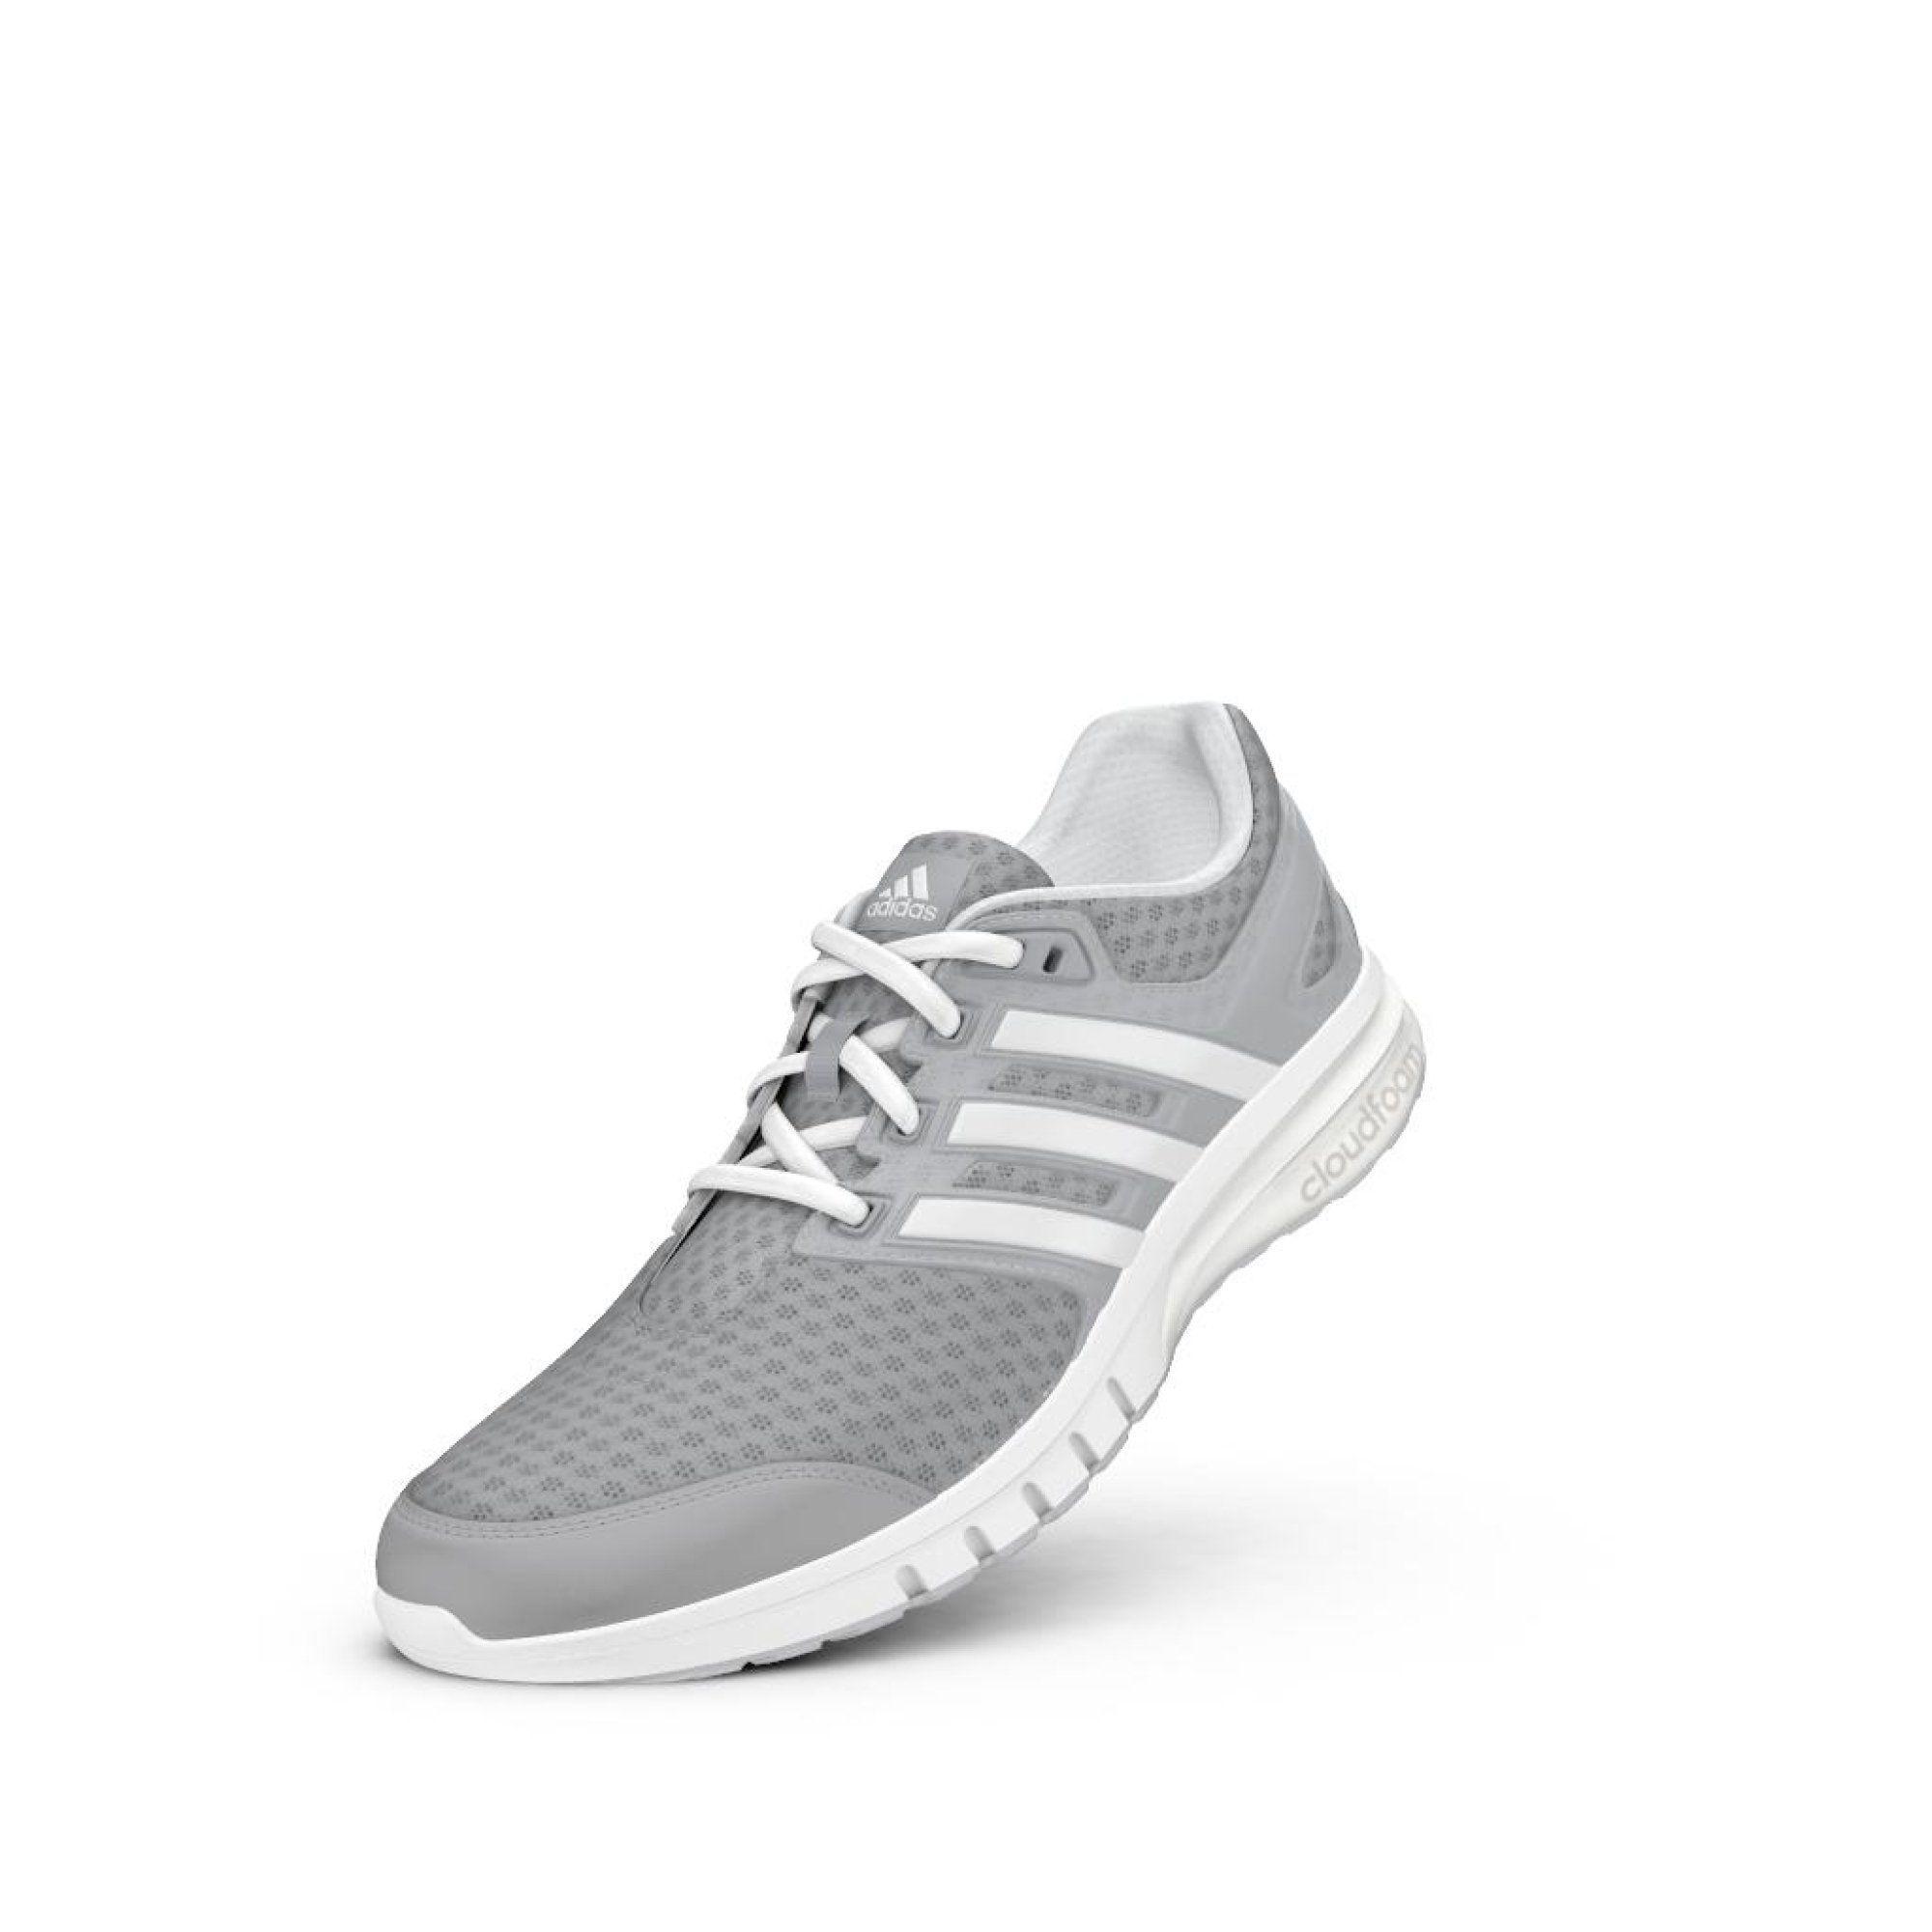 Adidas Performance  mujer 's Galaxy 2 Elite W corriendo zapatos , clara Onix